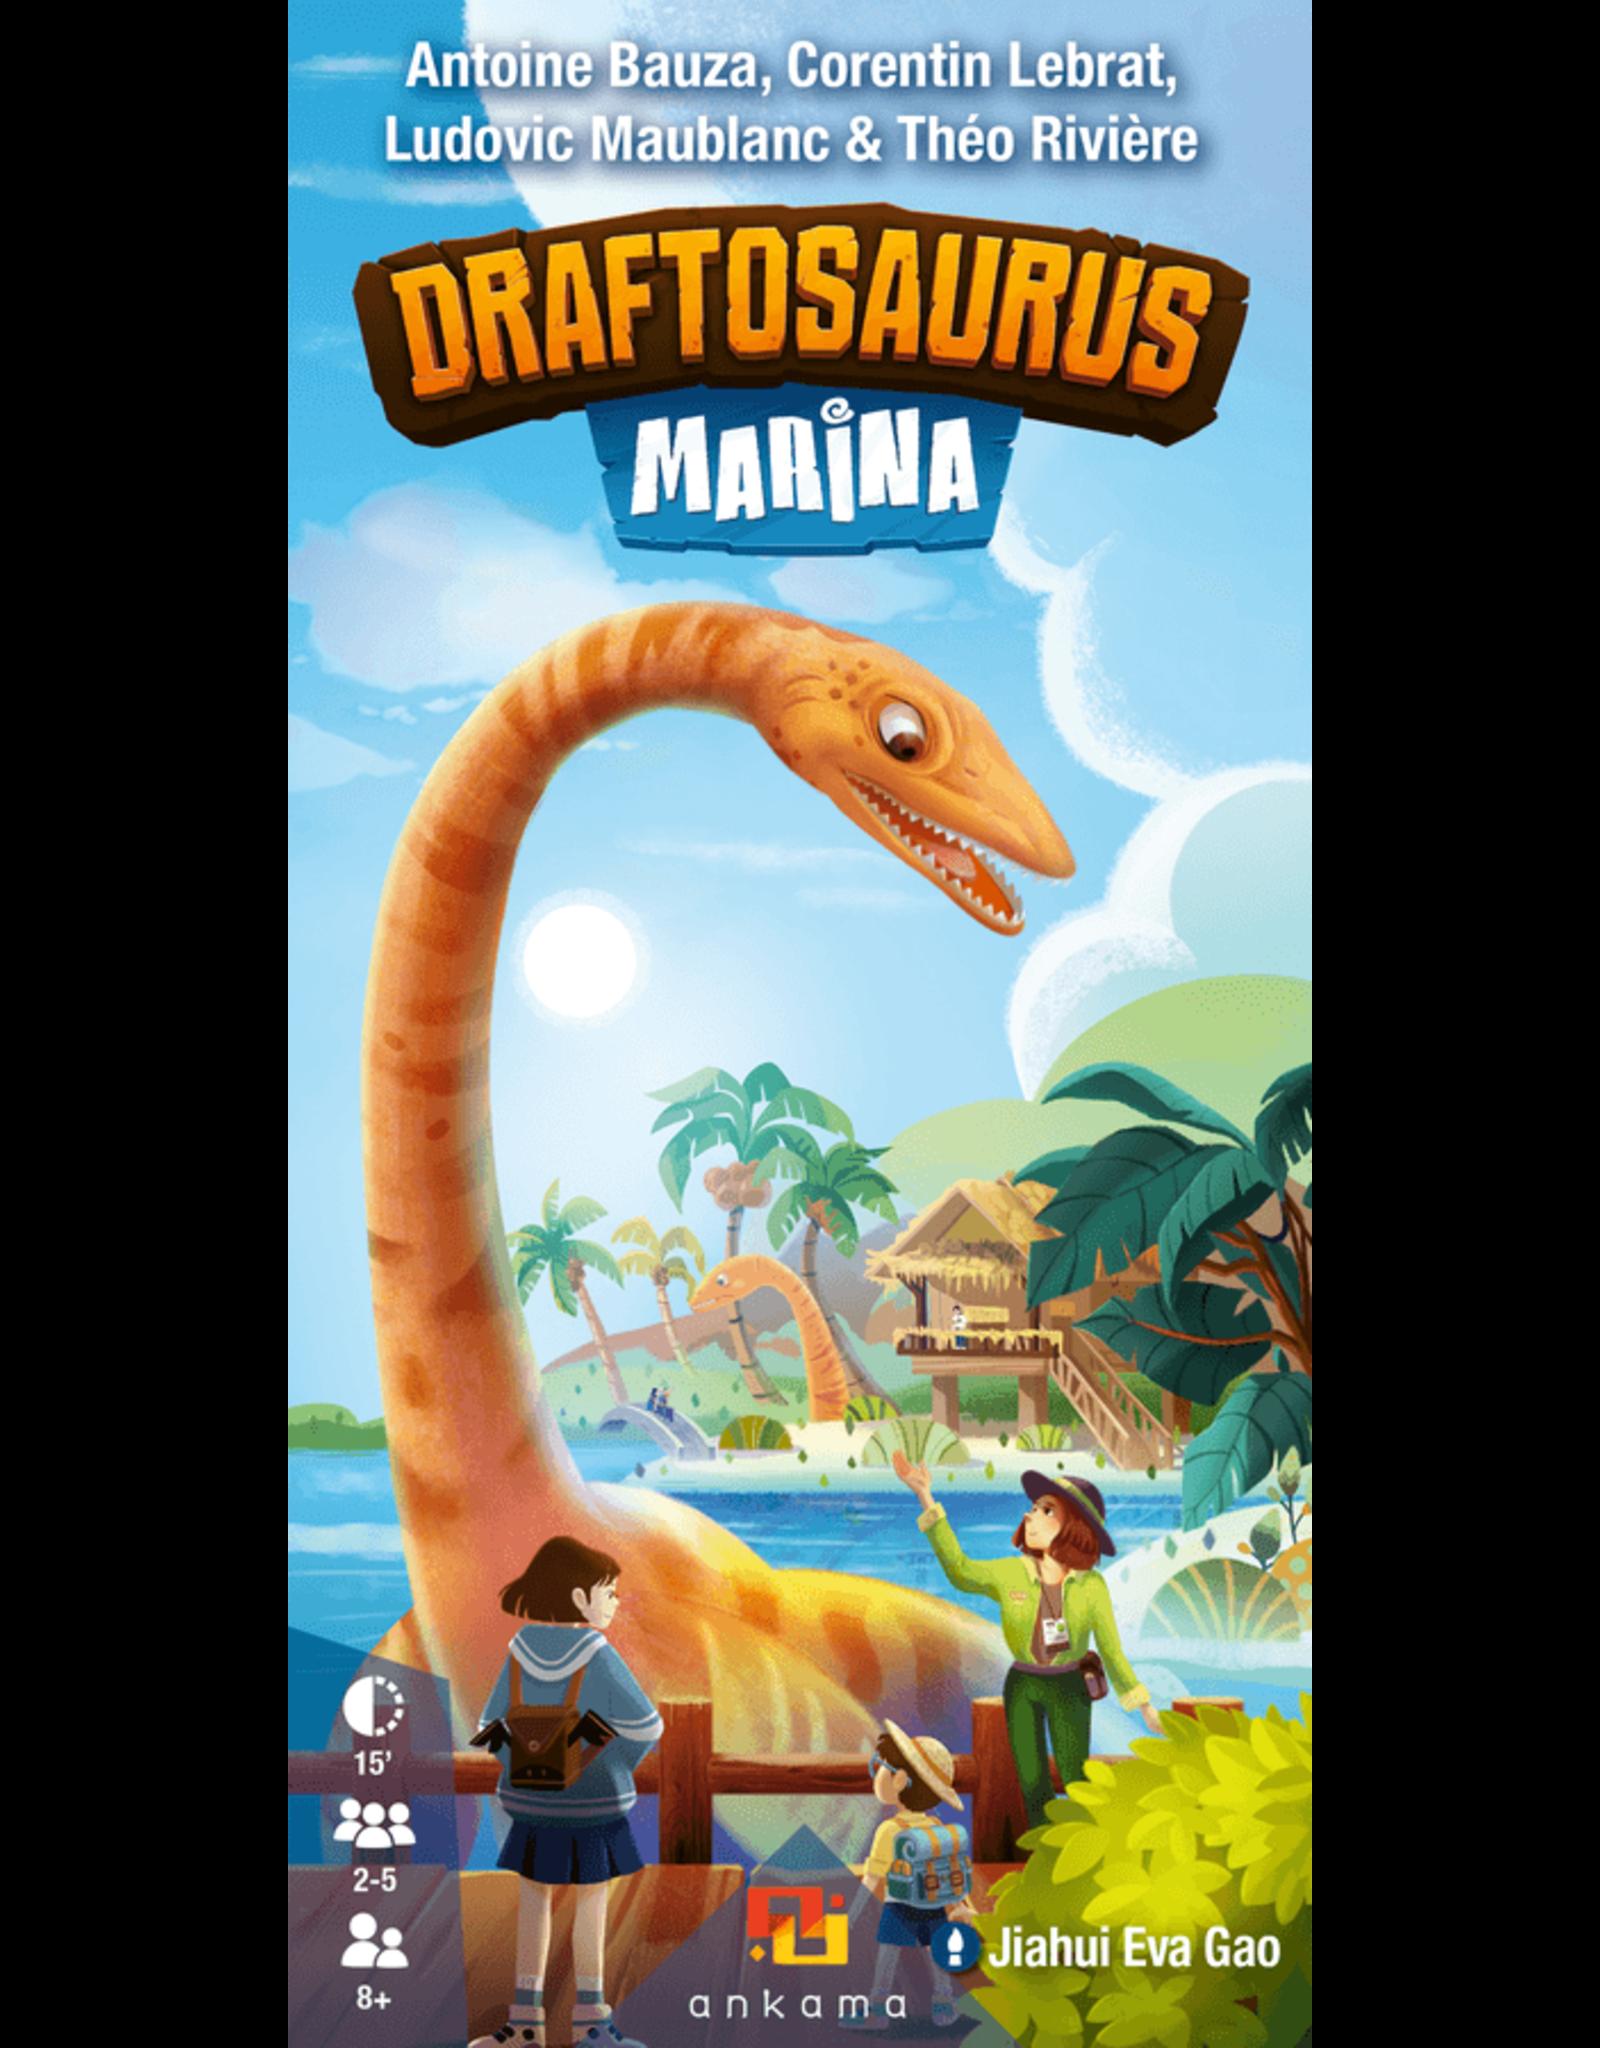 Ankama Draftosaurus: Marina Expansion